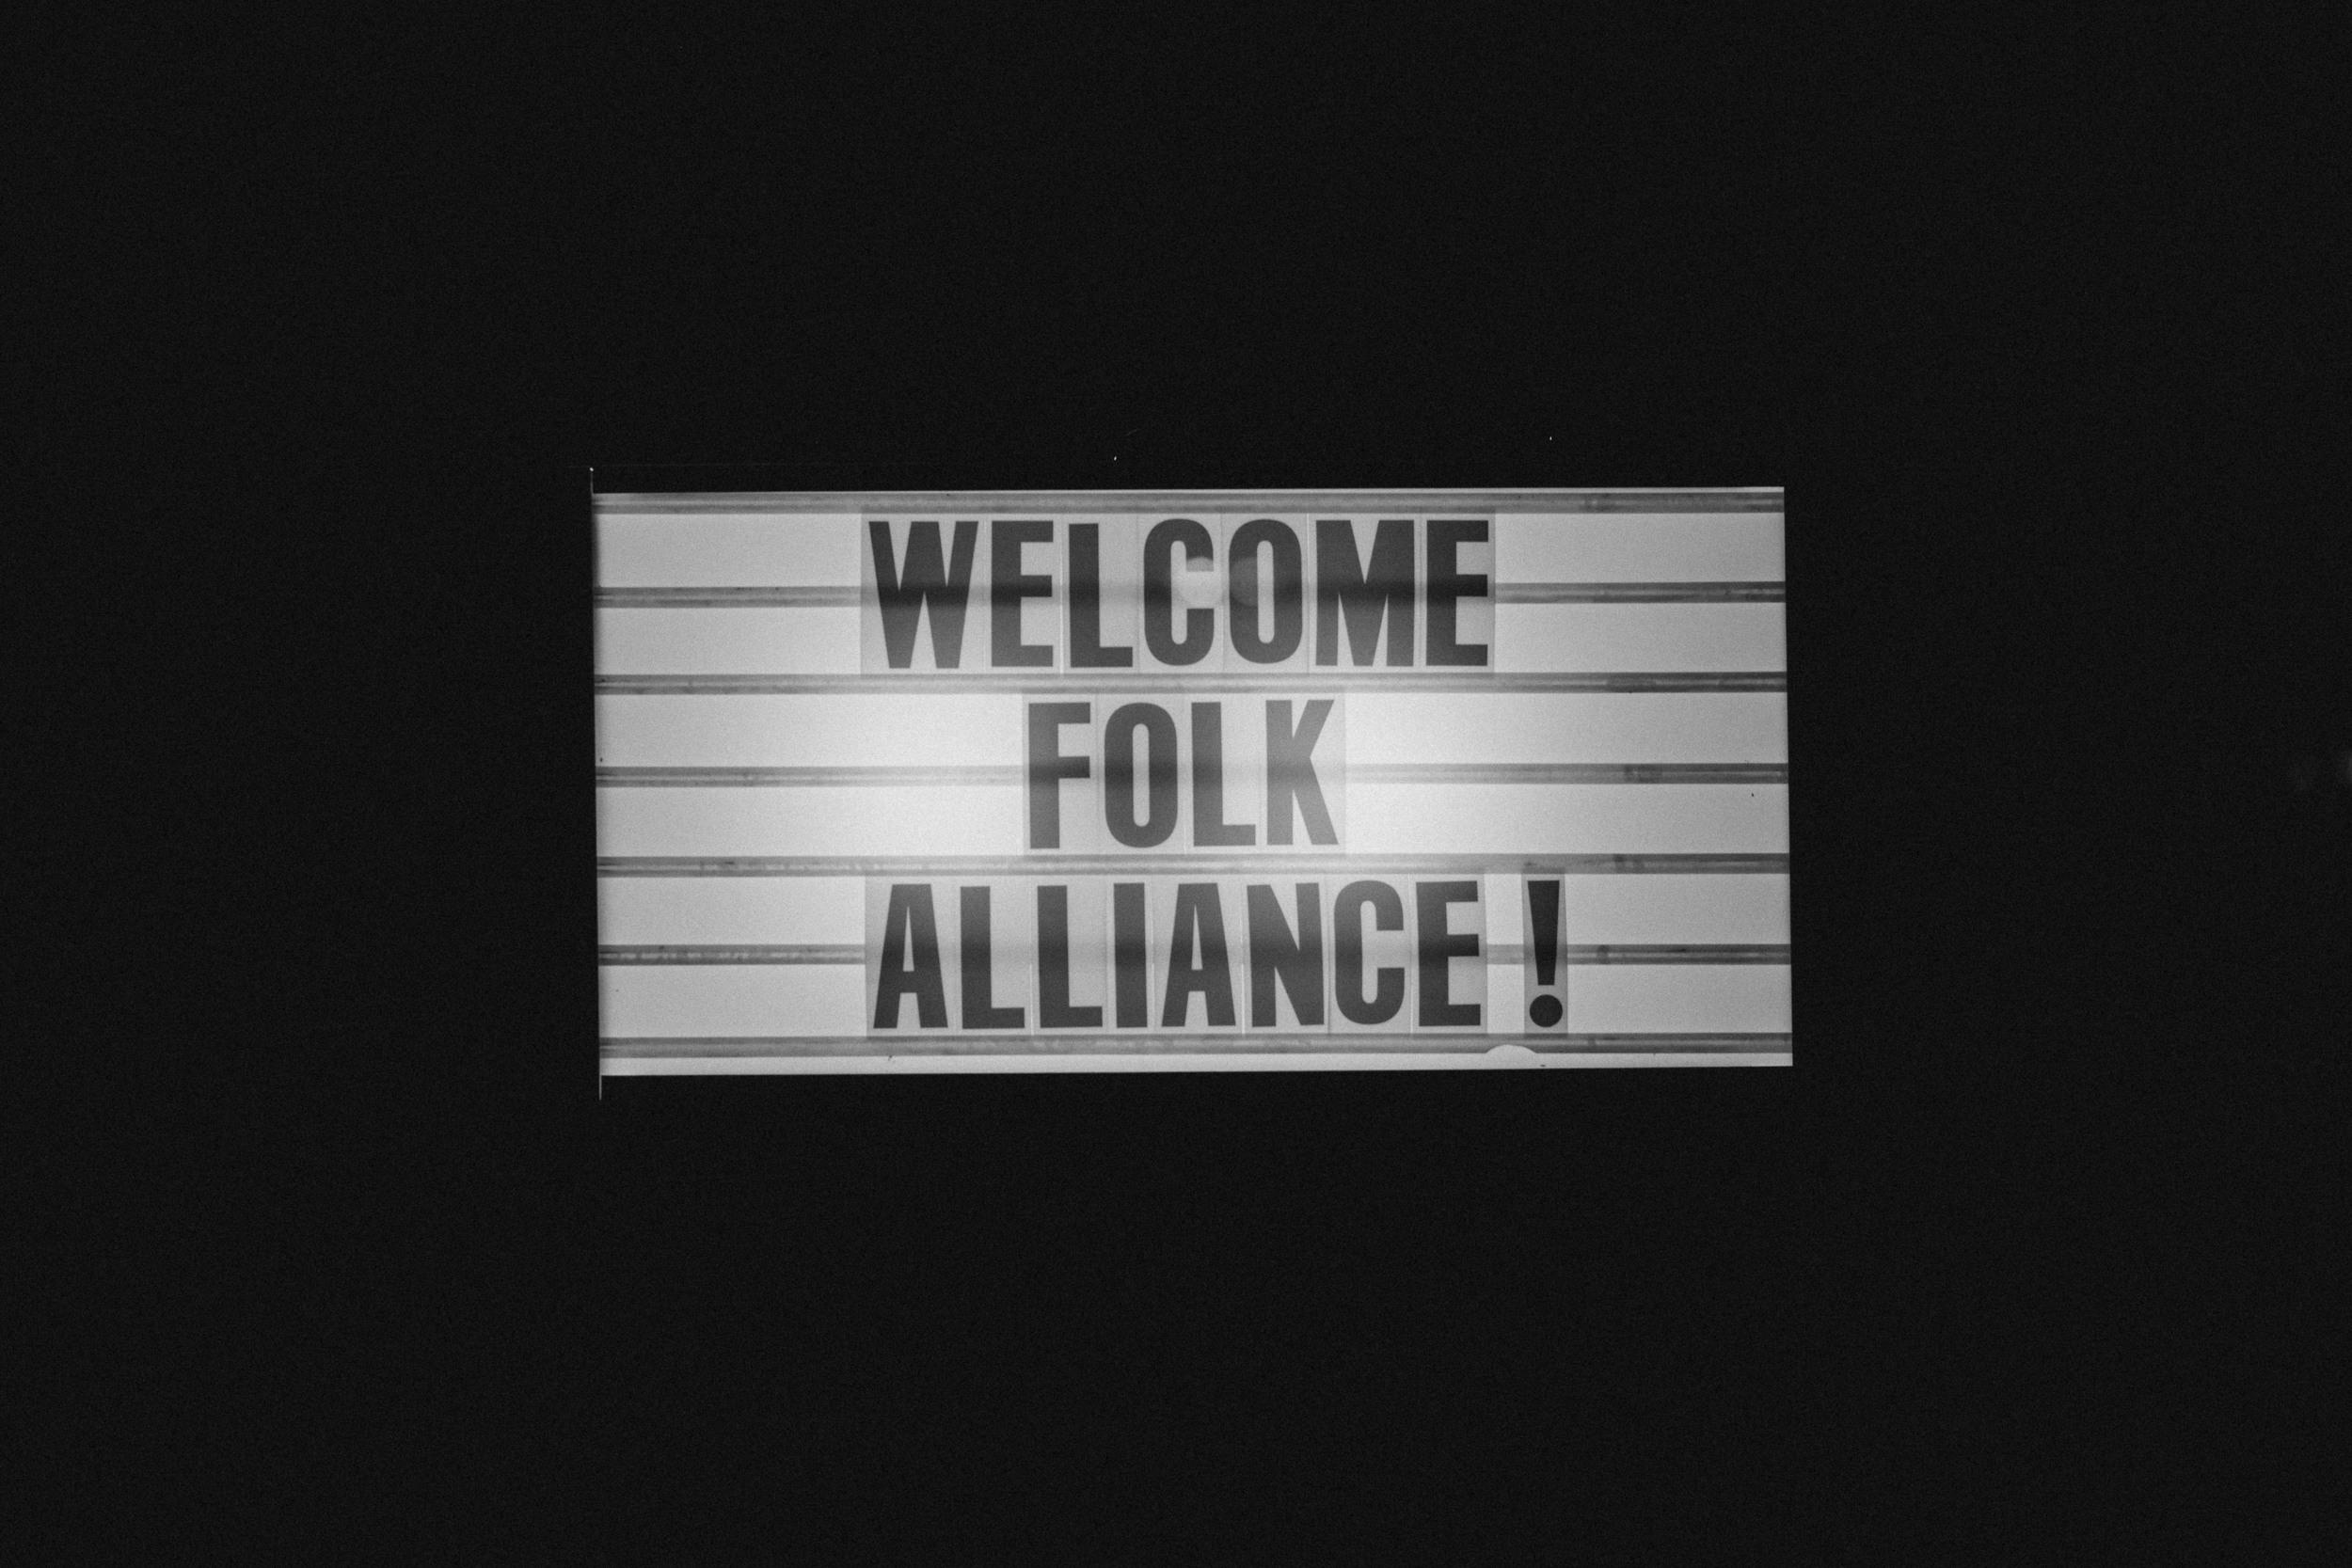 Alliance night # 2 - 1.jpg